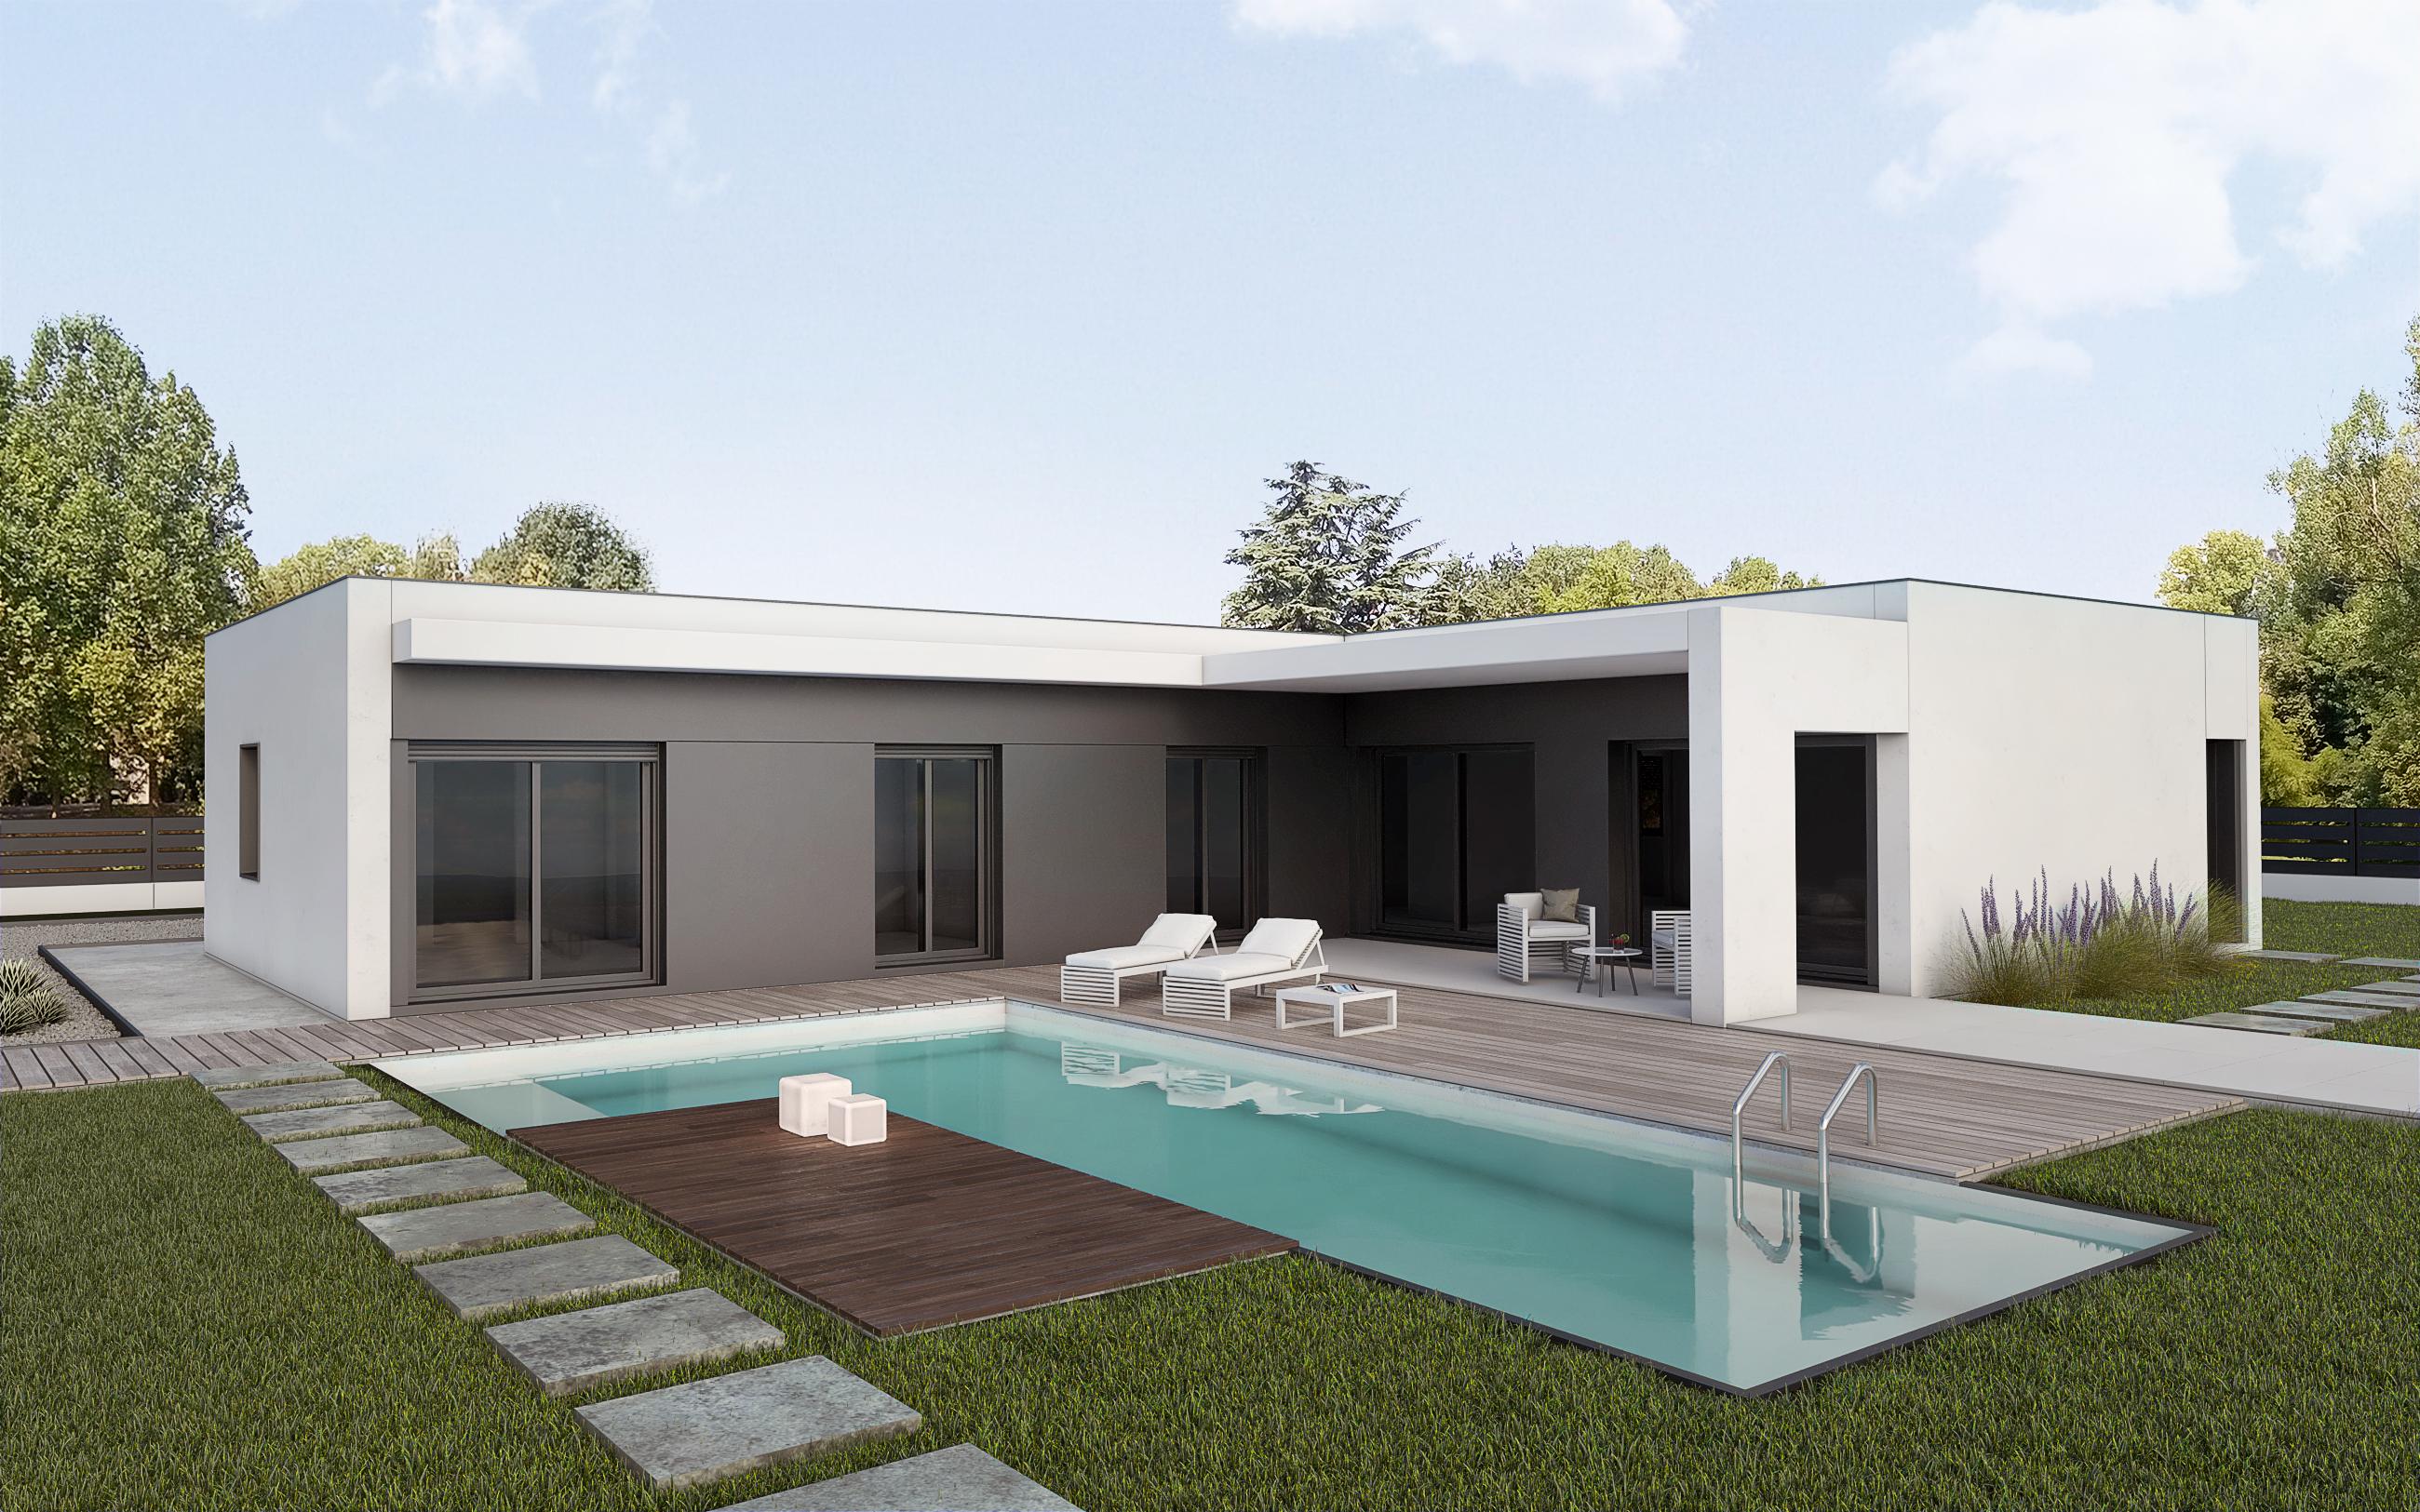 Hormipresa modelos de casas prefabricadas de hormig n for Modelos de casas de una planta modernas